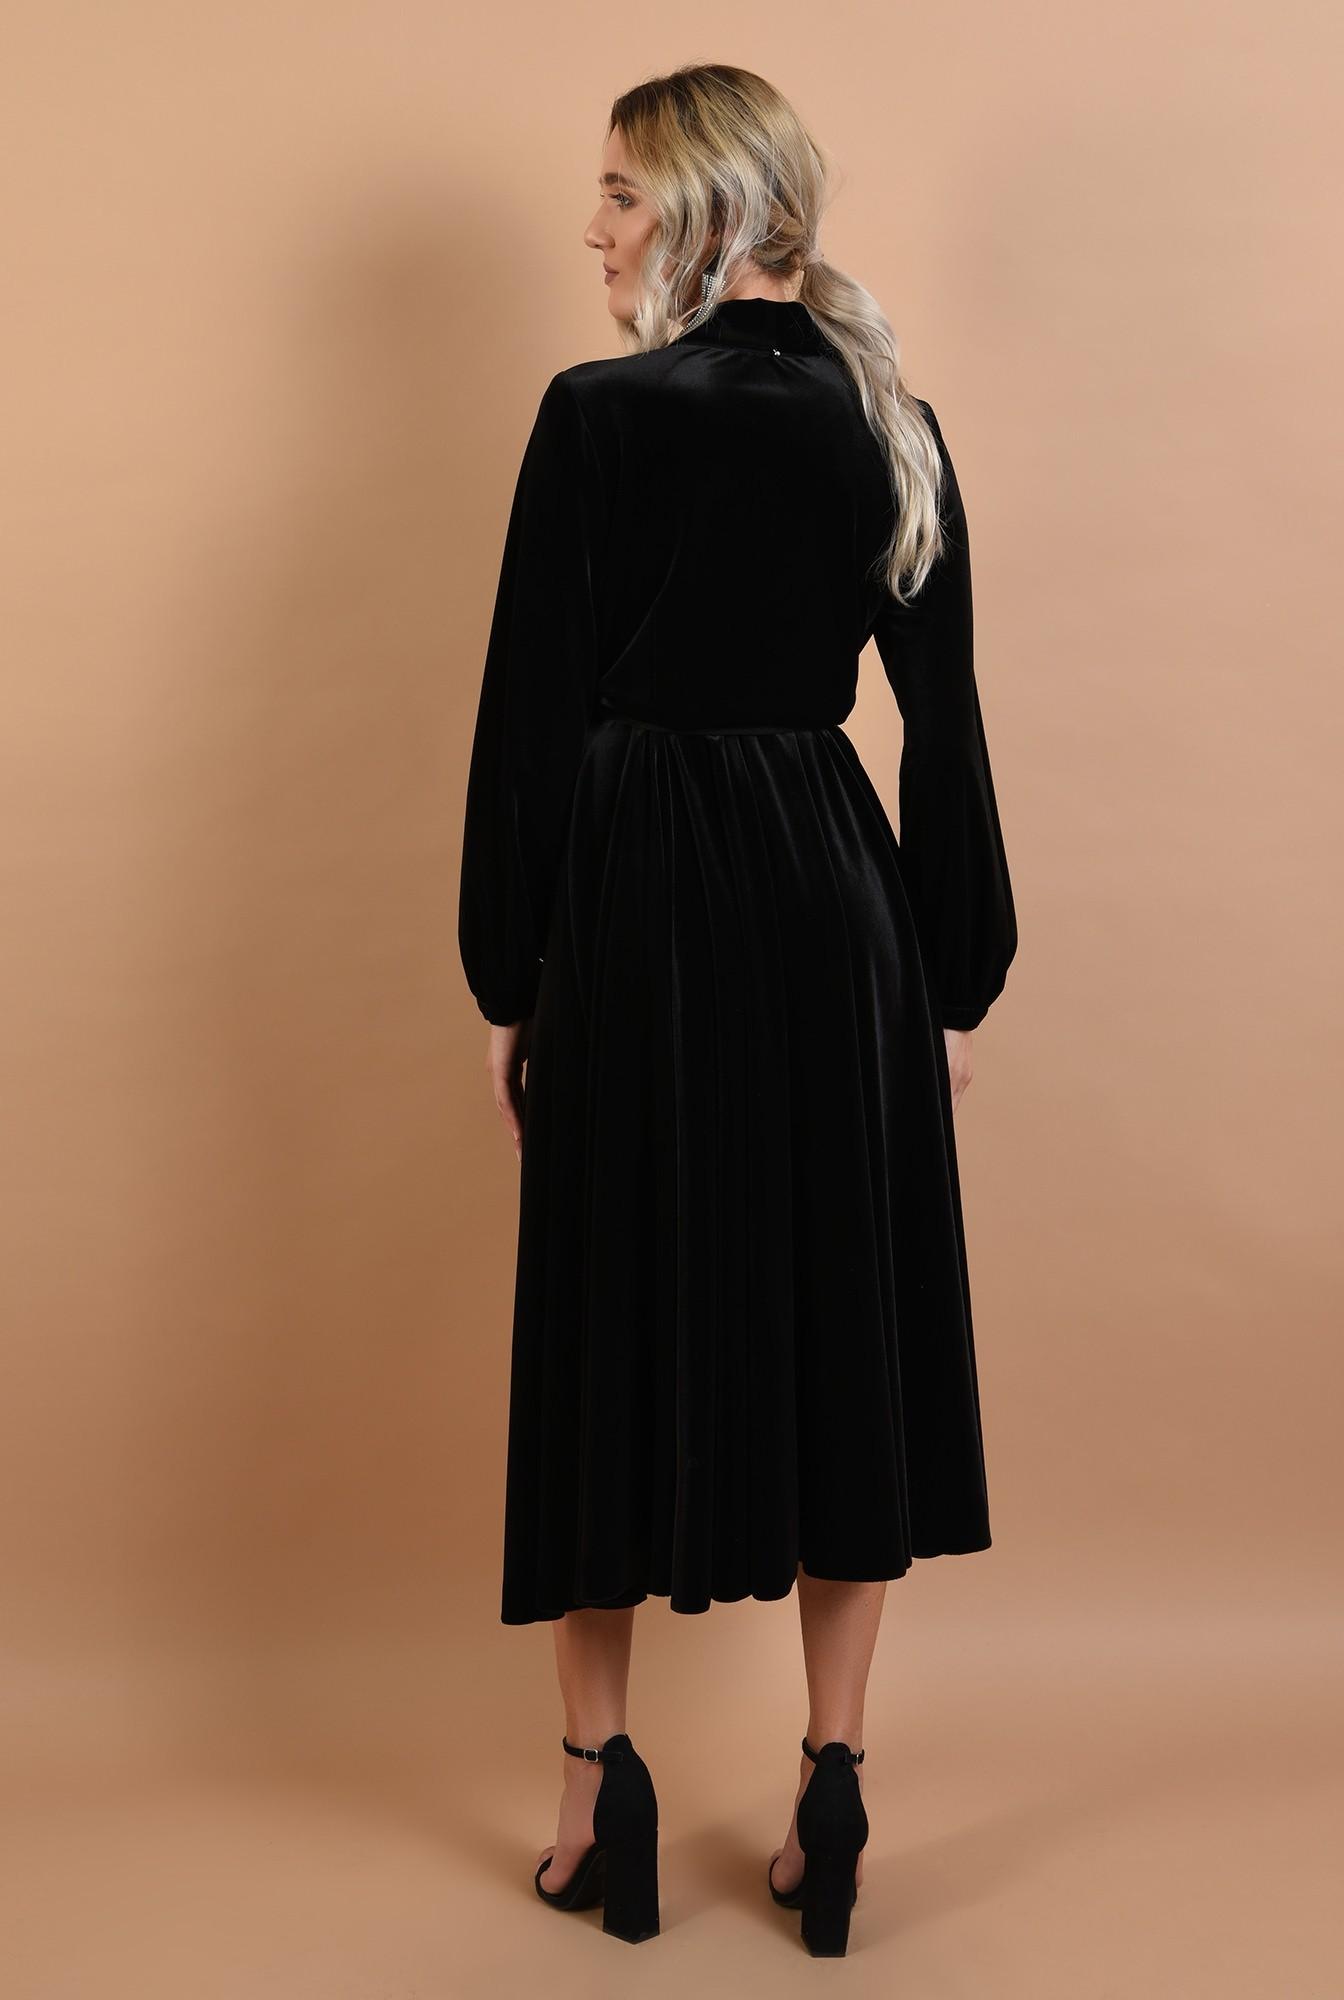 1 - 360 - rochie eleganta, midi, evazata, cu cordon, maneci lungi